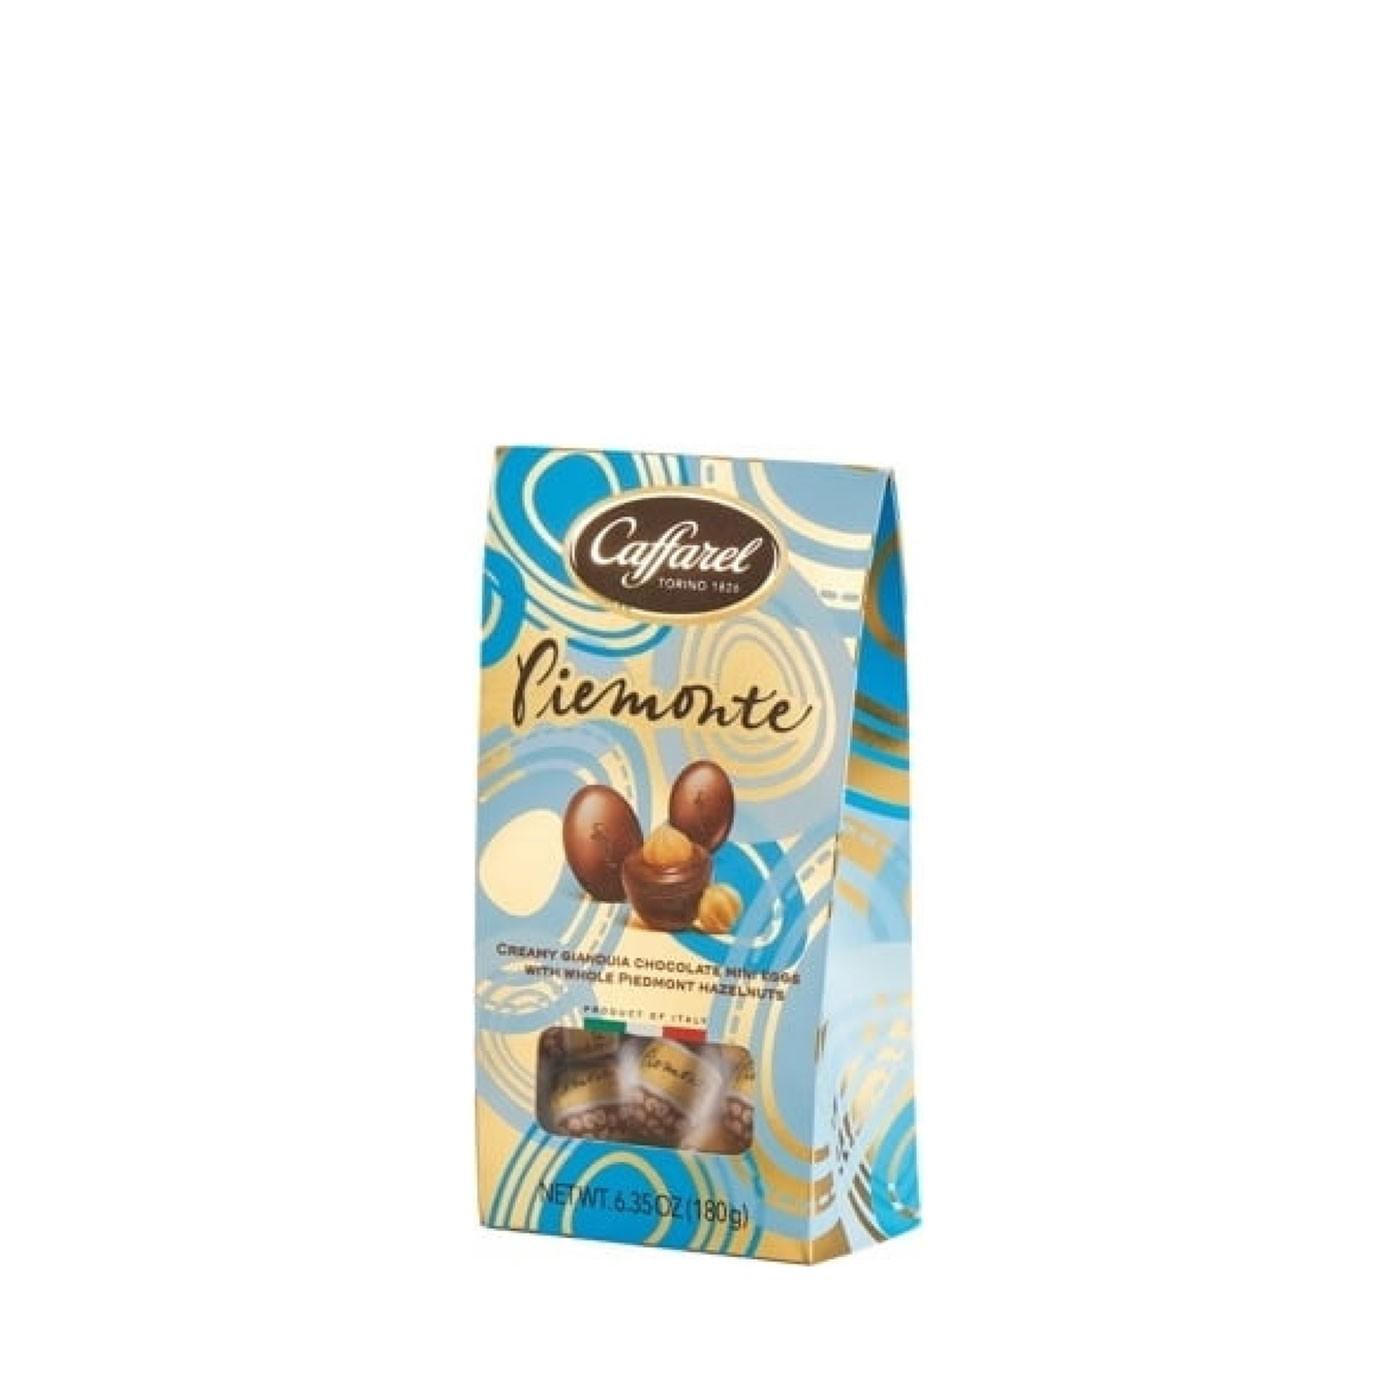 Piemonte Mini Hazelnut Chocolate Eggs 4.94 oz